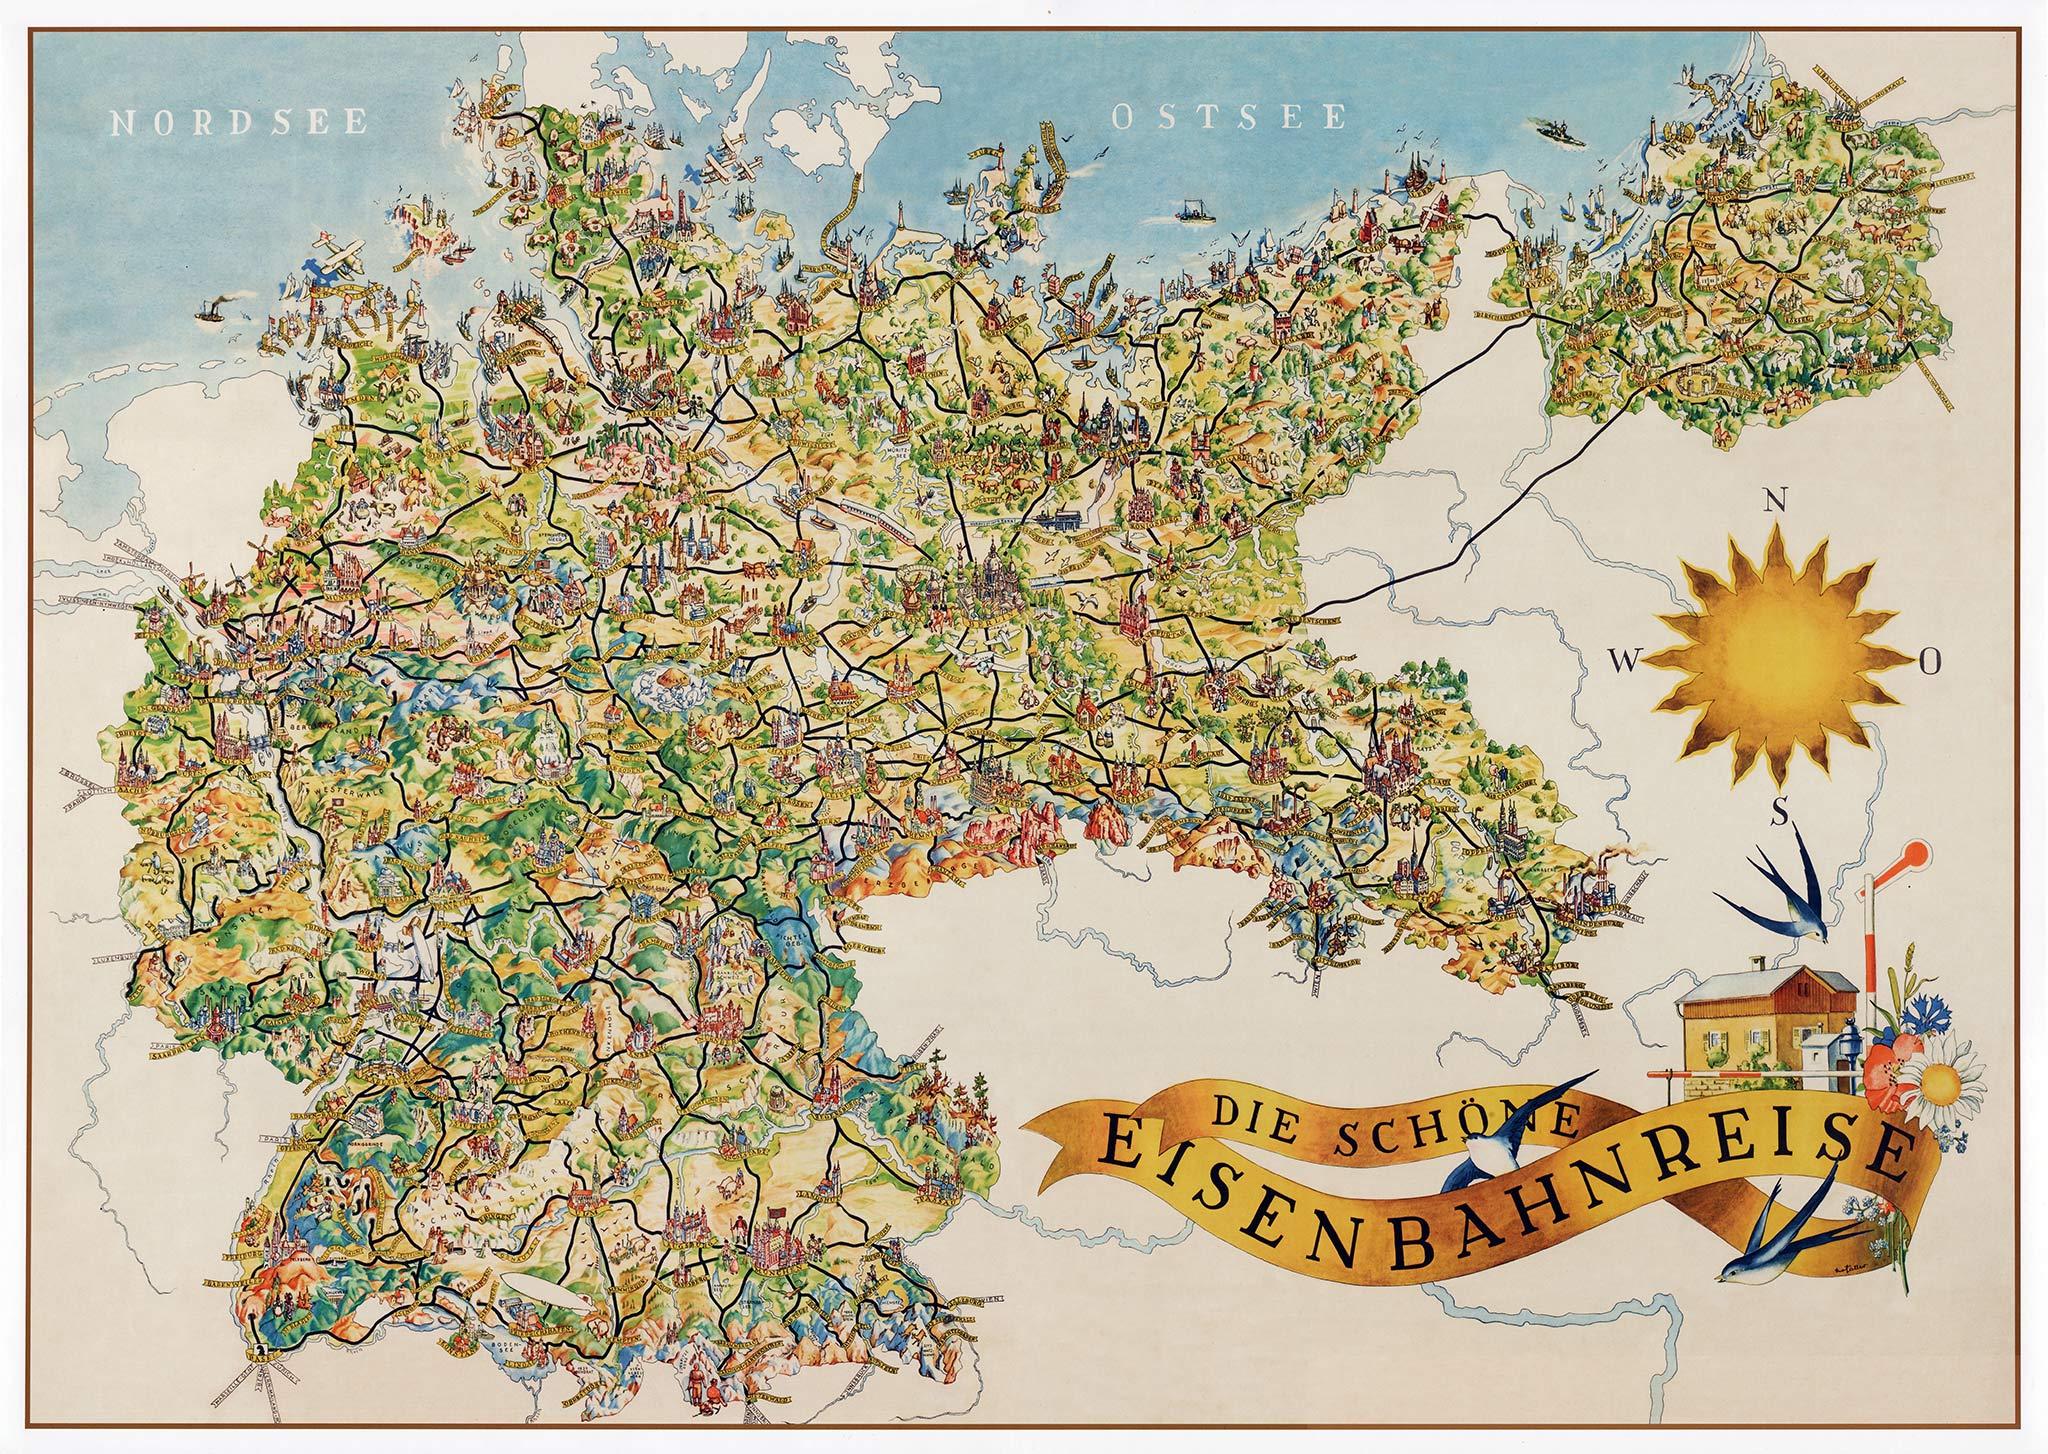 Giethoorn Karte.Pictorial Railway Maps Telling Stories Retours